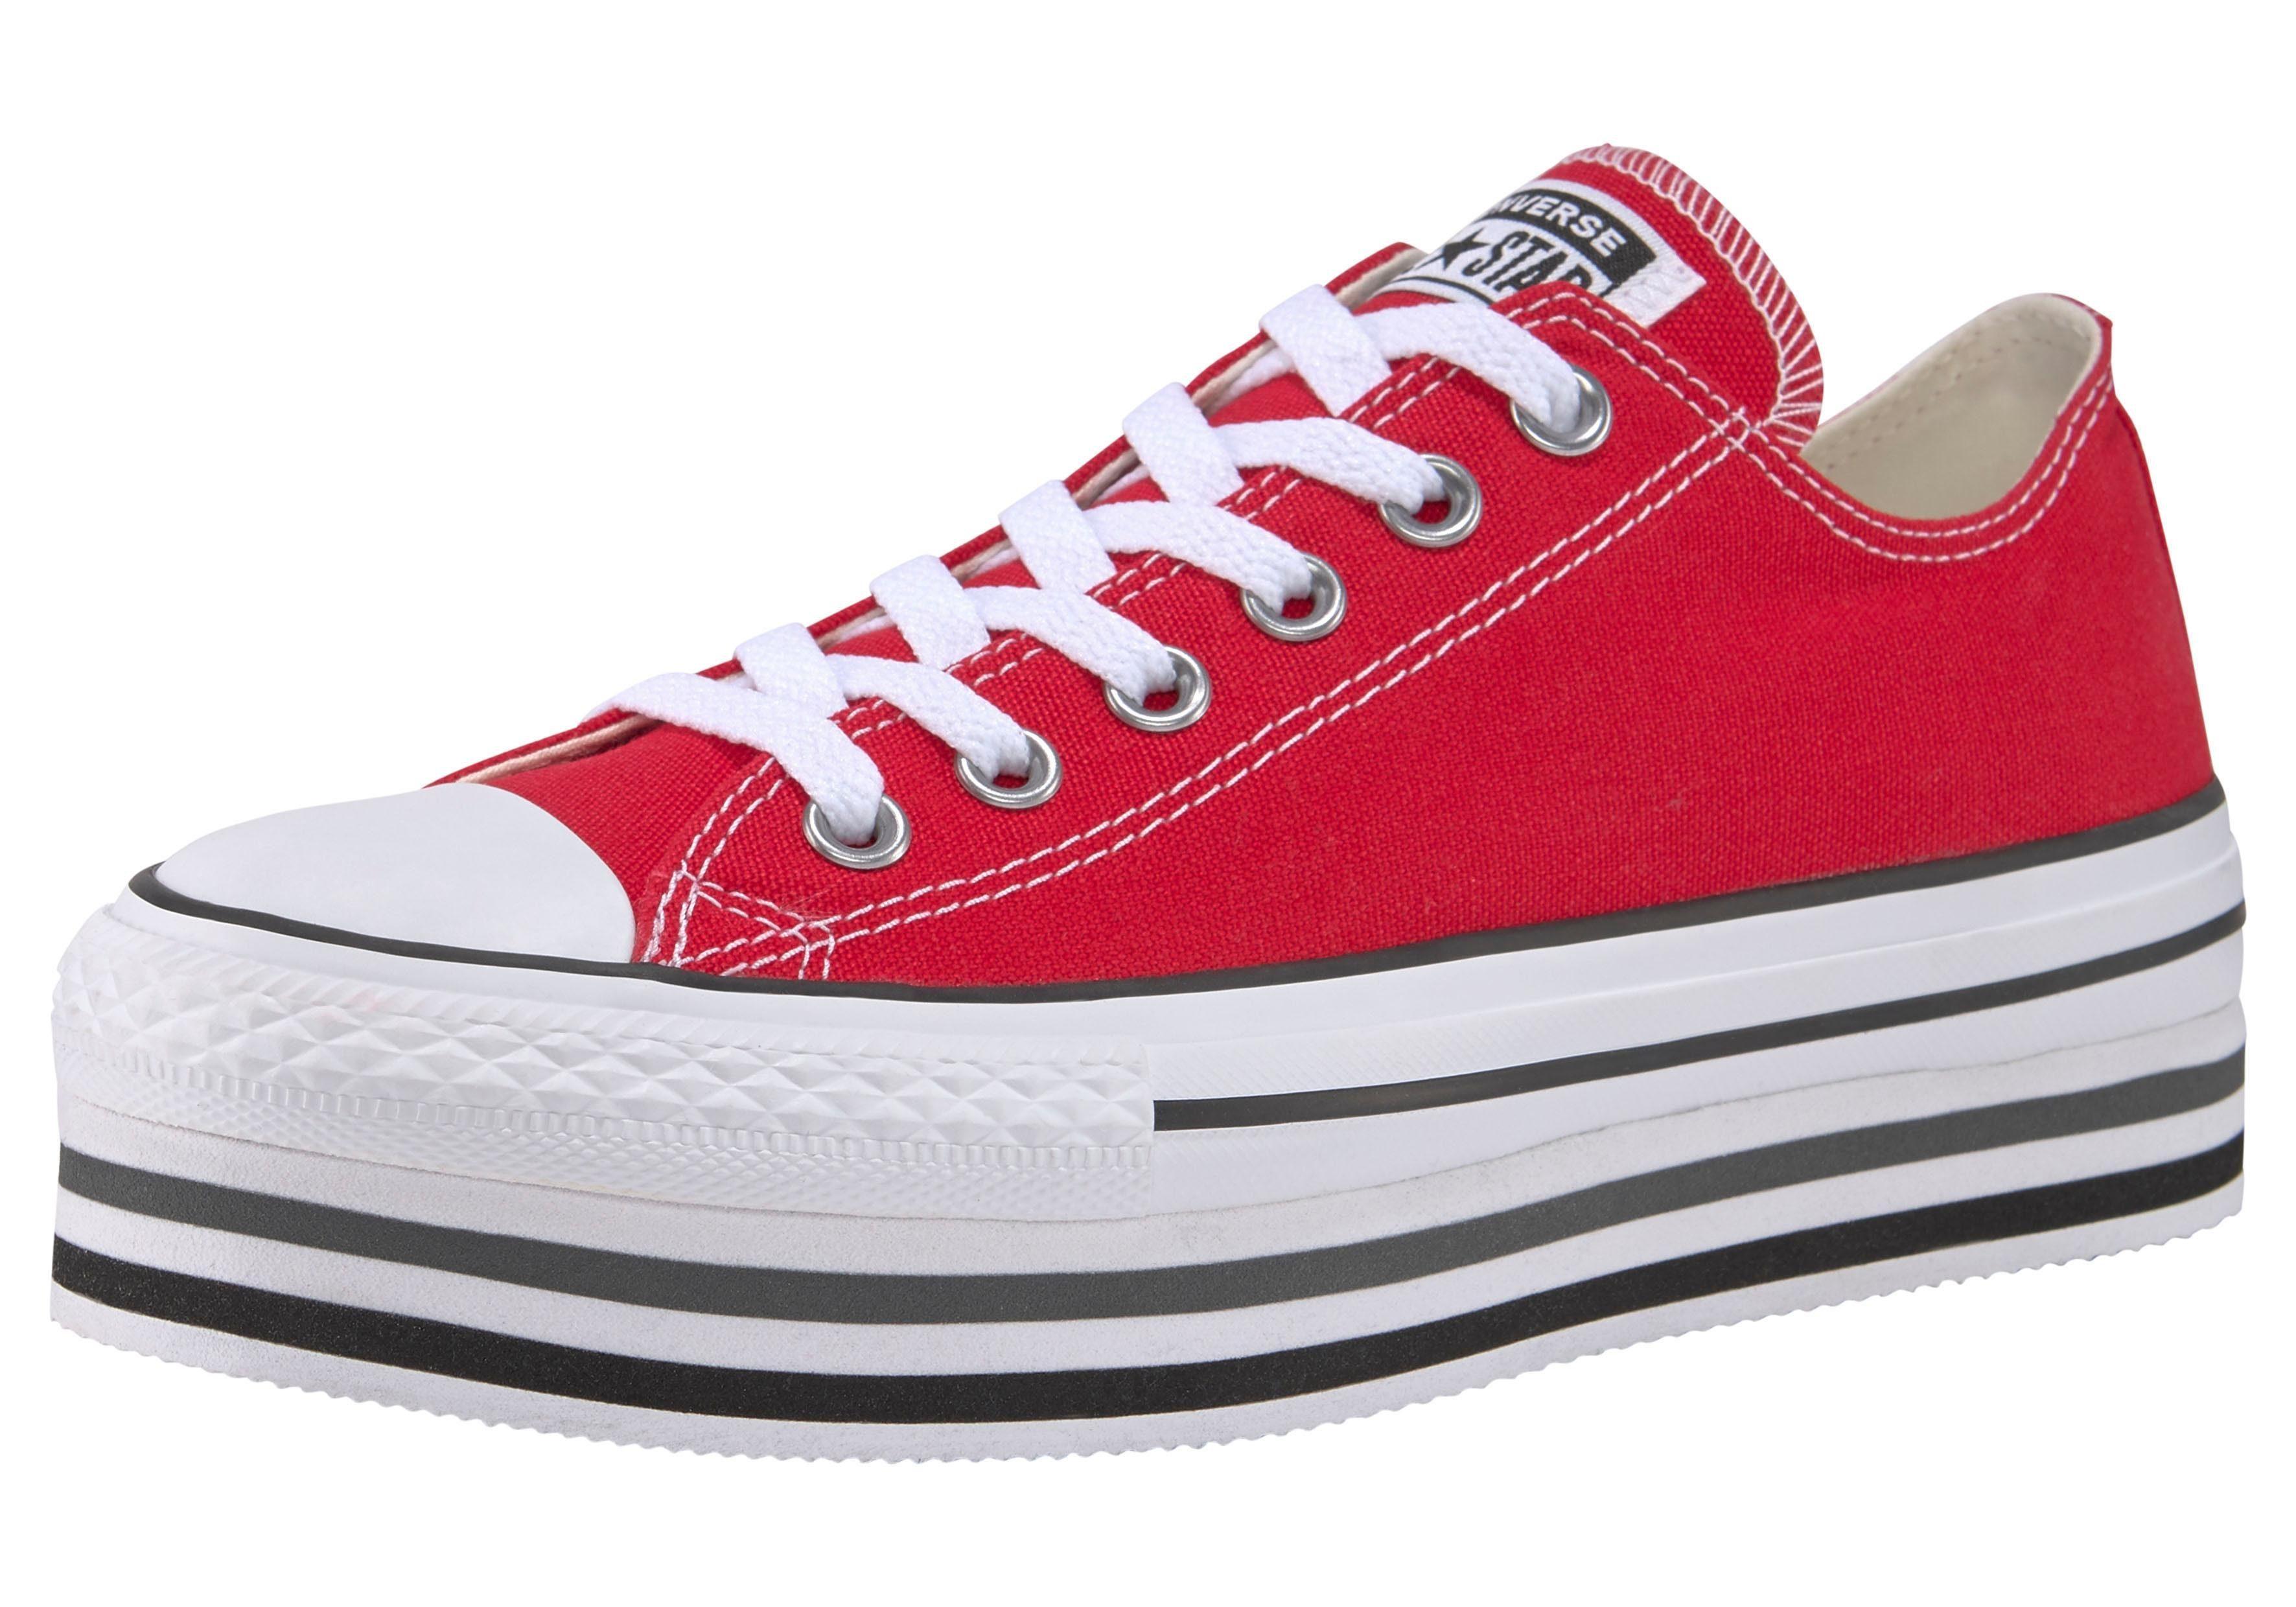 Converse »One Star Lugged« Sneaker, Hochwertiges Obermaterial online kaufen | OTTO